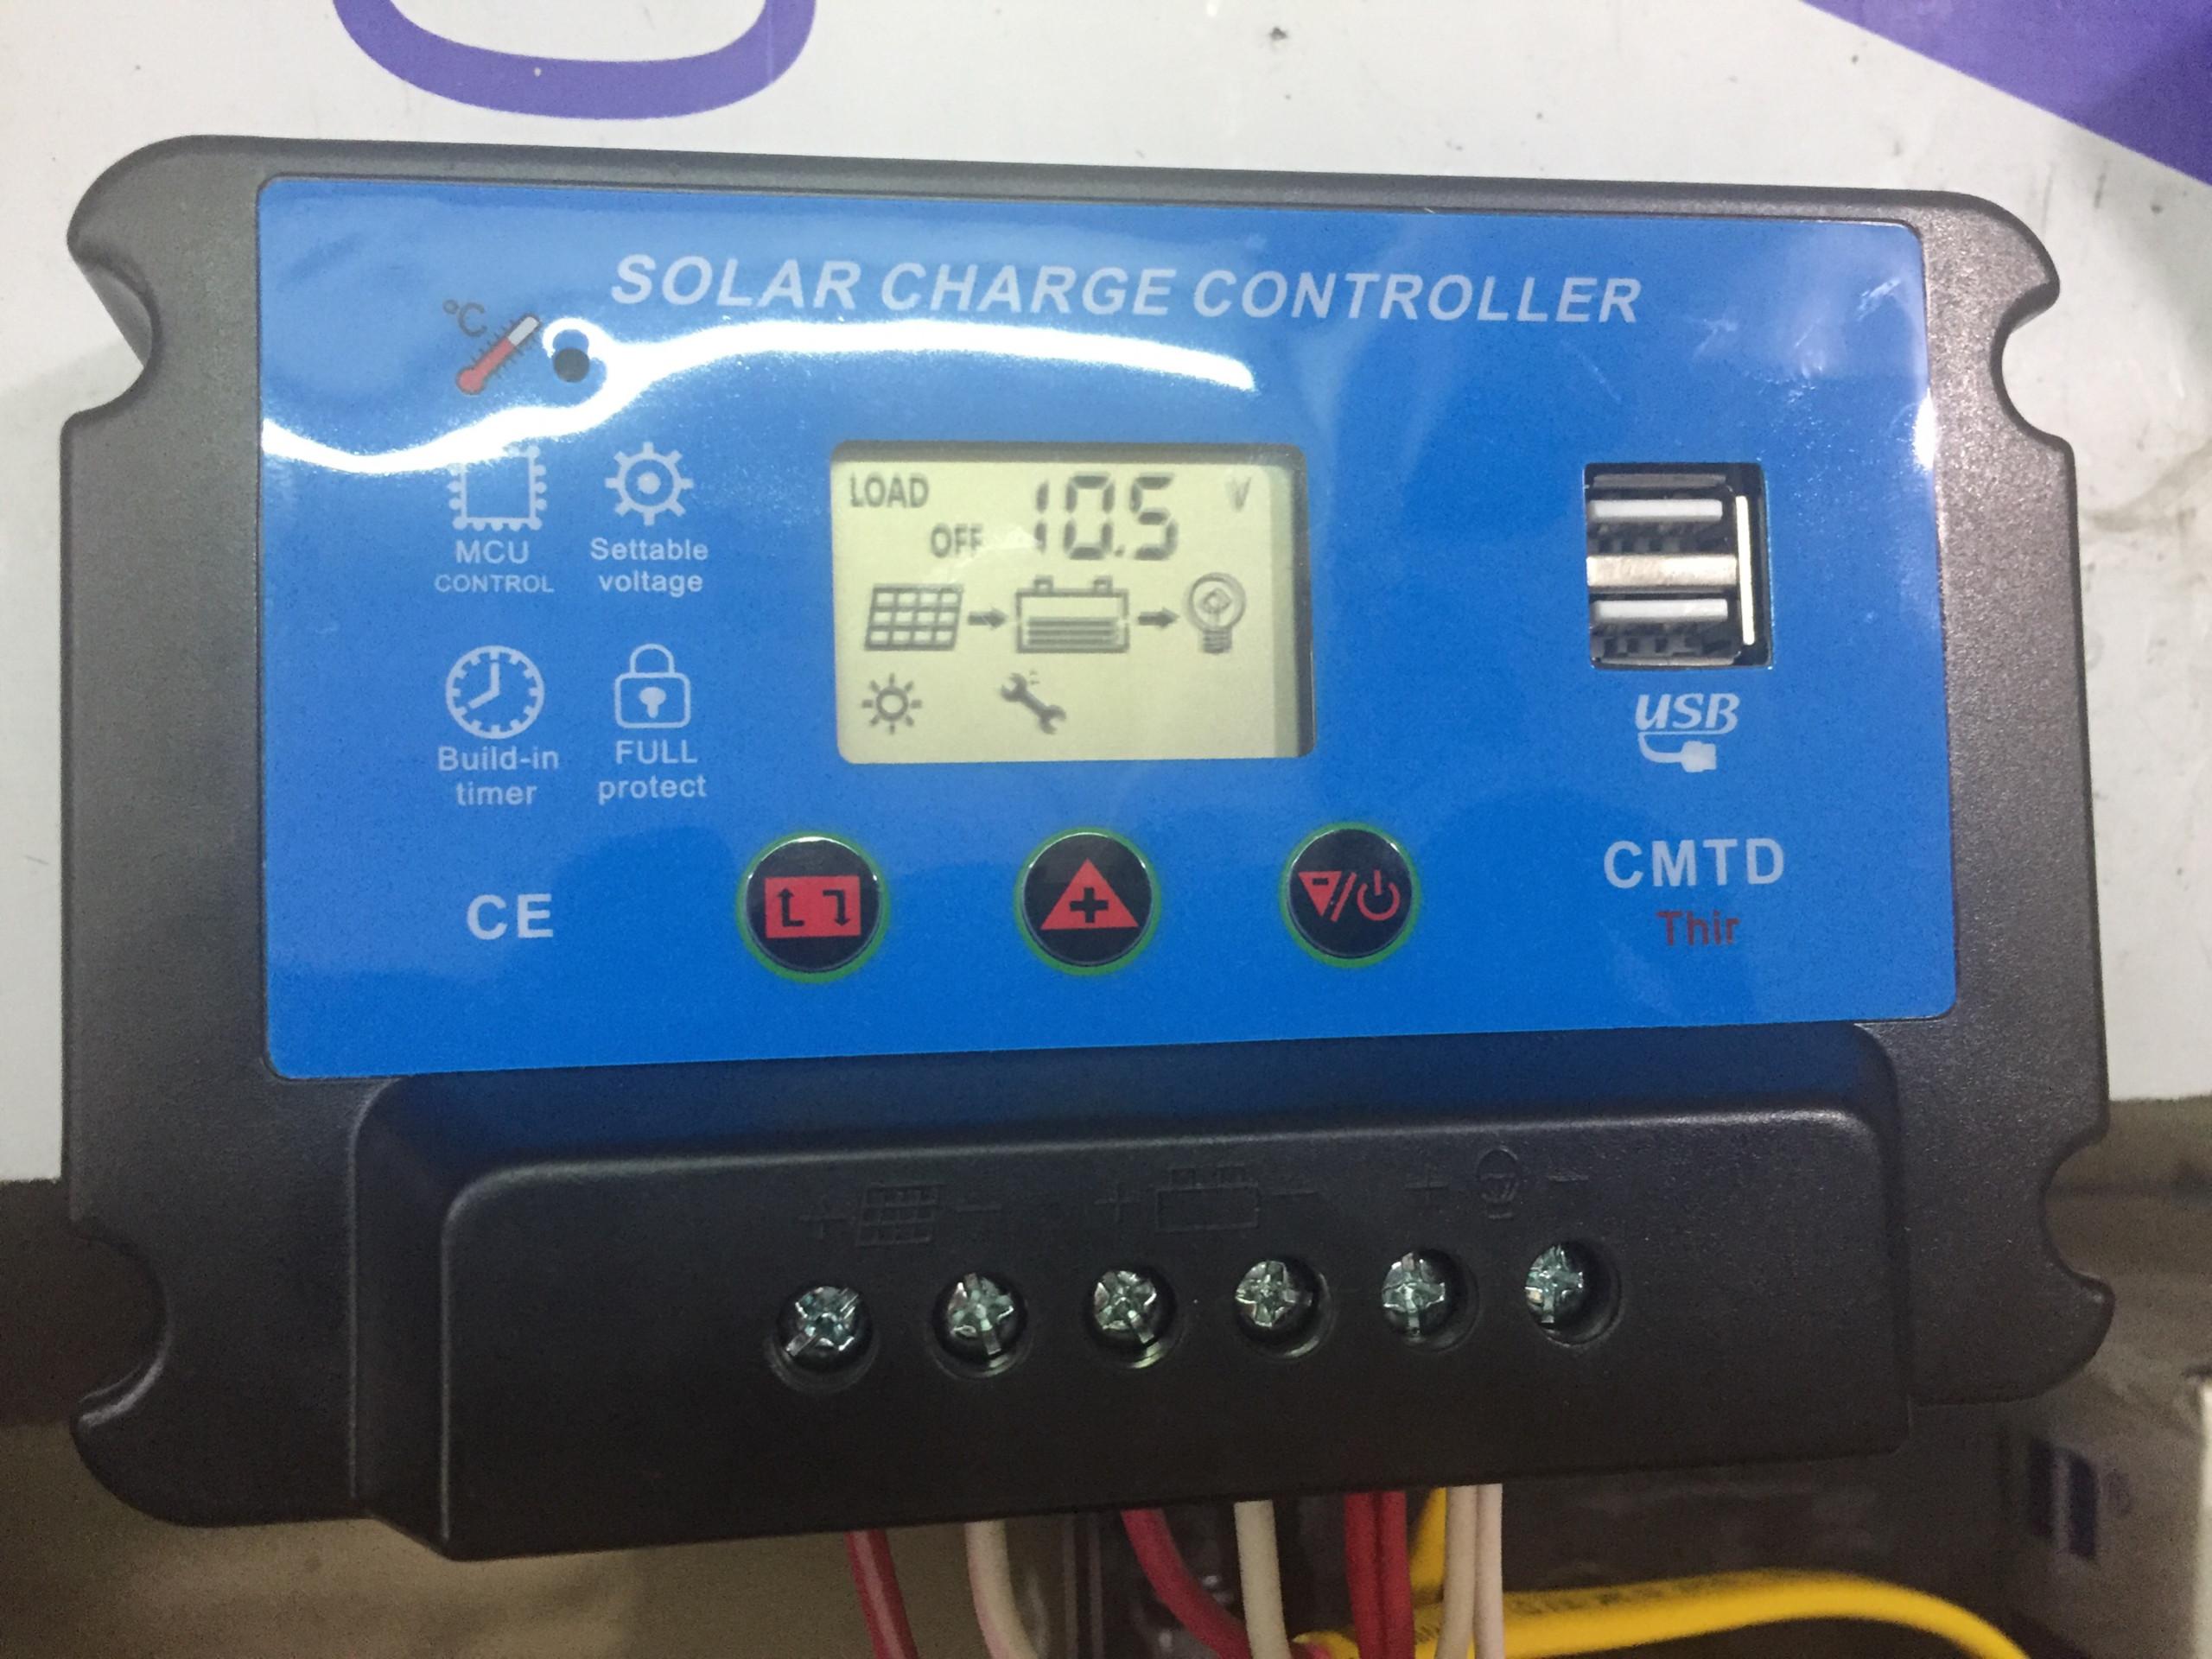 bộ điều khiển sạc solar charger controller 30a